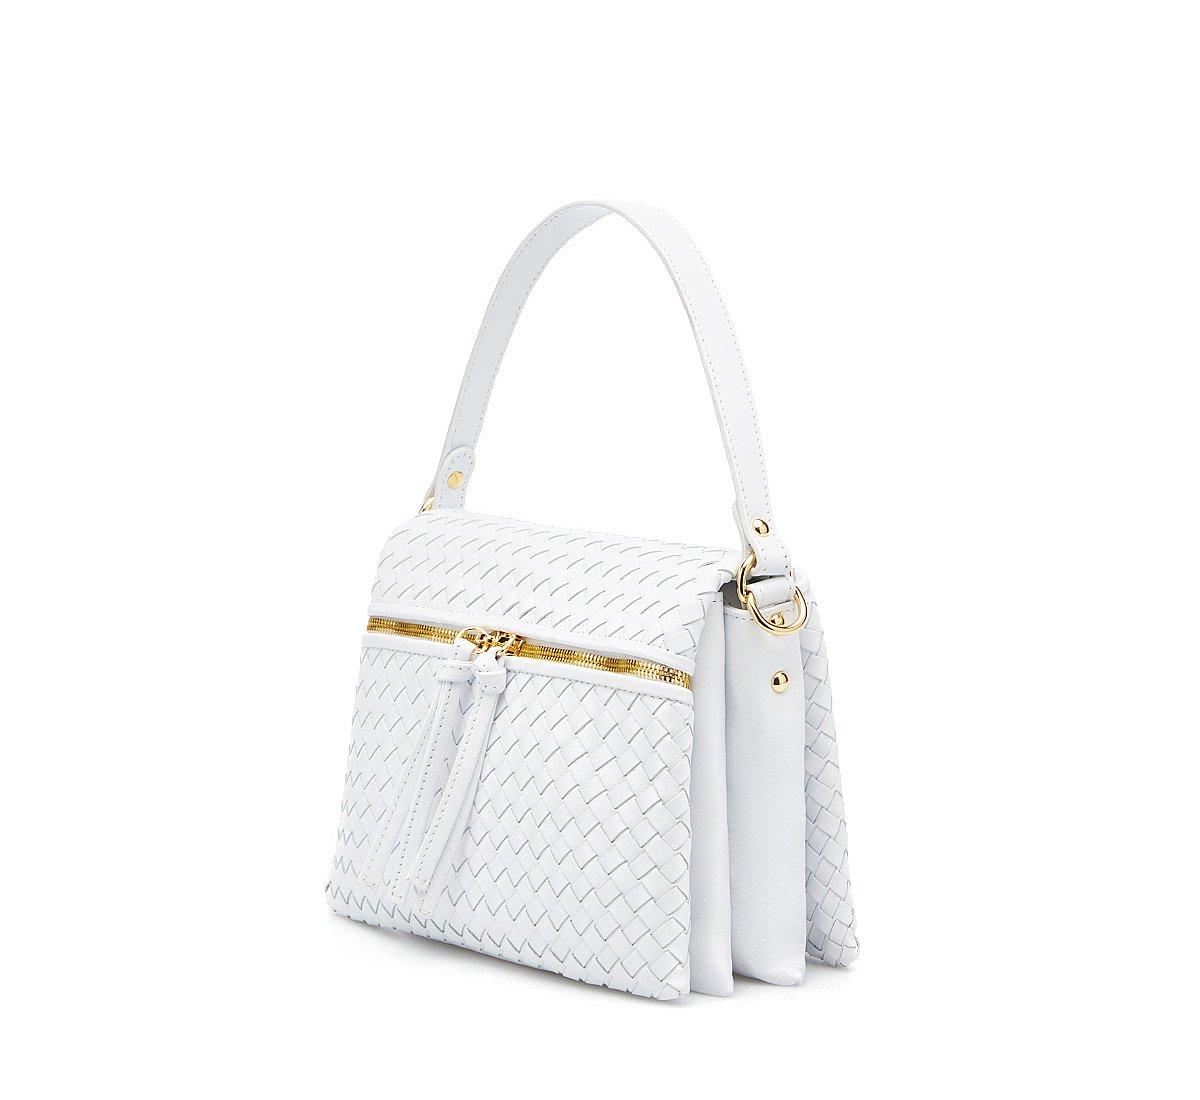 City bag with woven calfskin